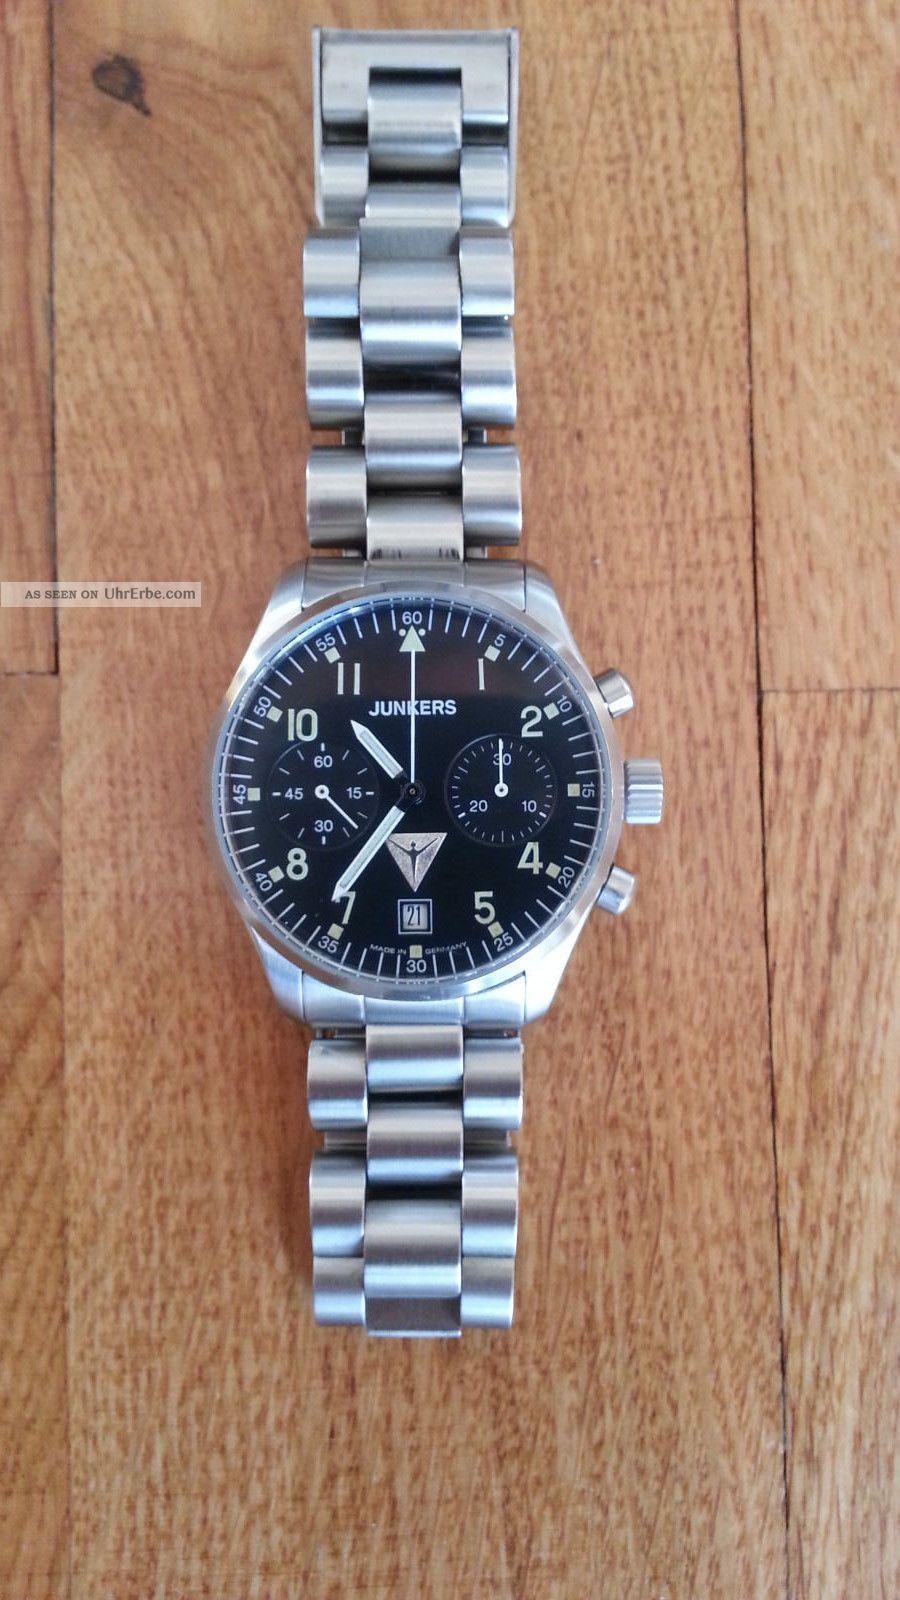 Chronograph Junkers 6202 - 1 Kaliber P3133 Handaufzug Armbanduhren Bild